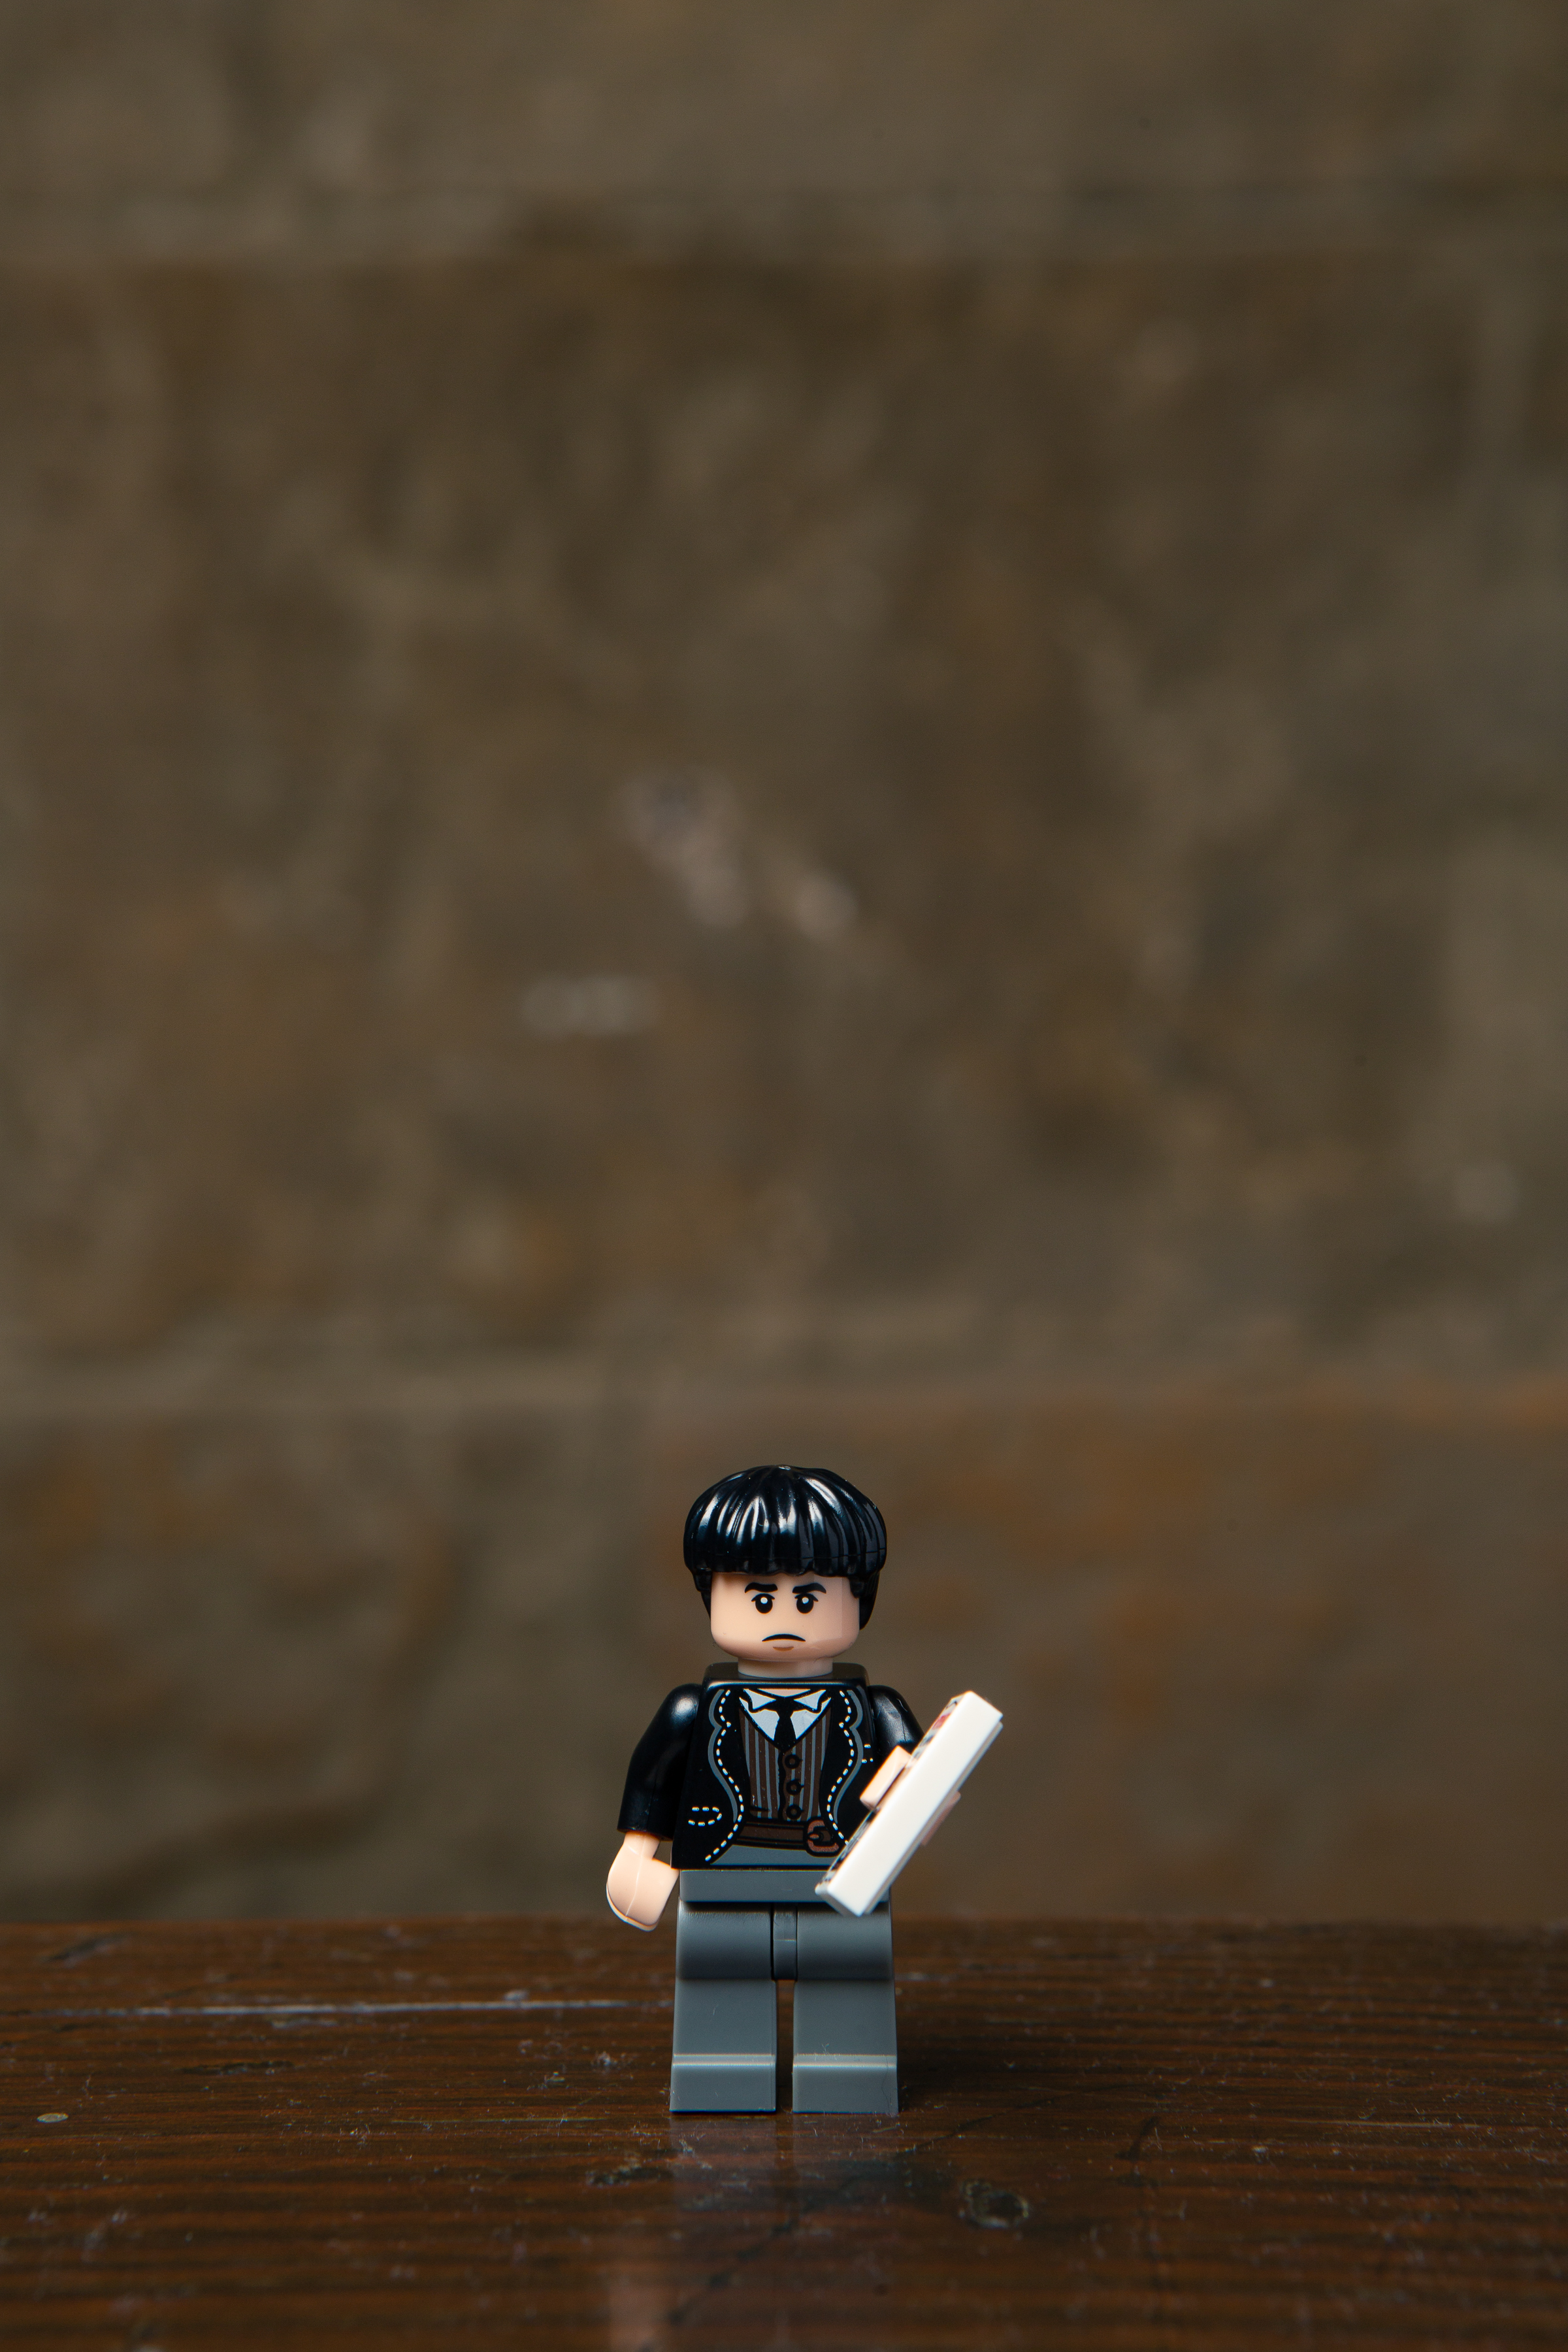 LEGO_WBST_19.06.18_hi-res-9.jpg